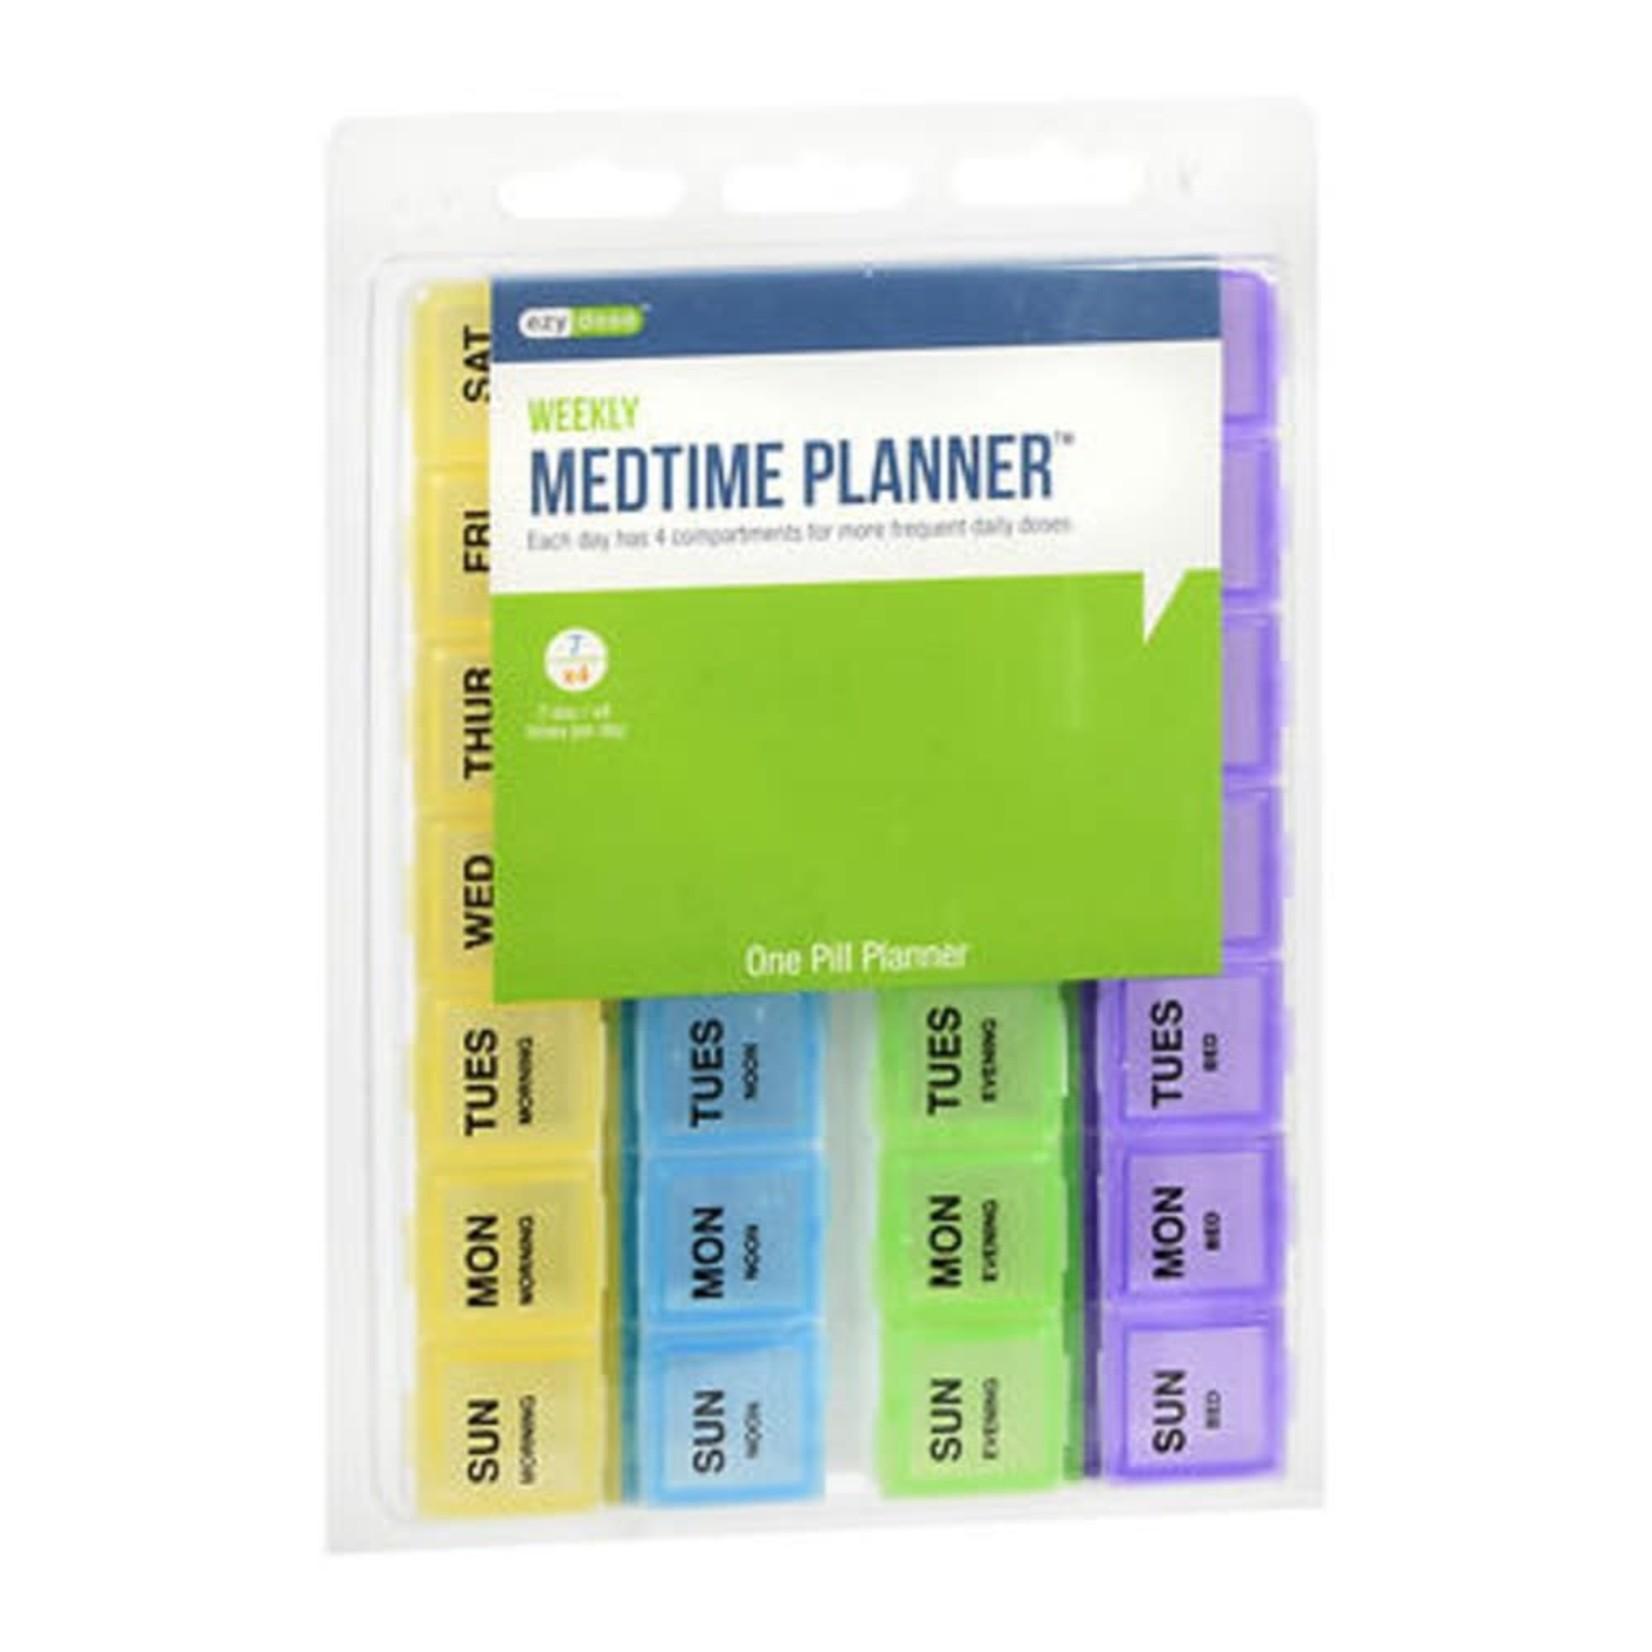 Medtime Plan 4/day 7day